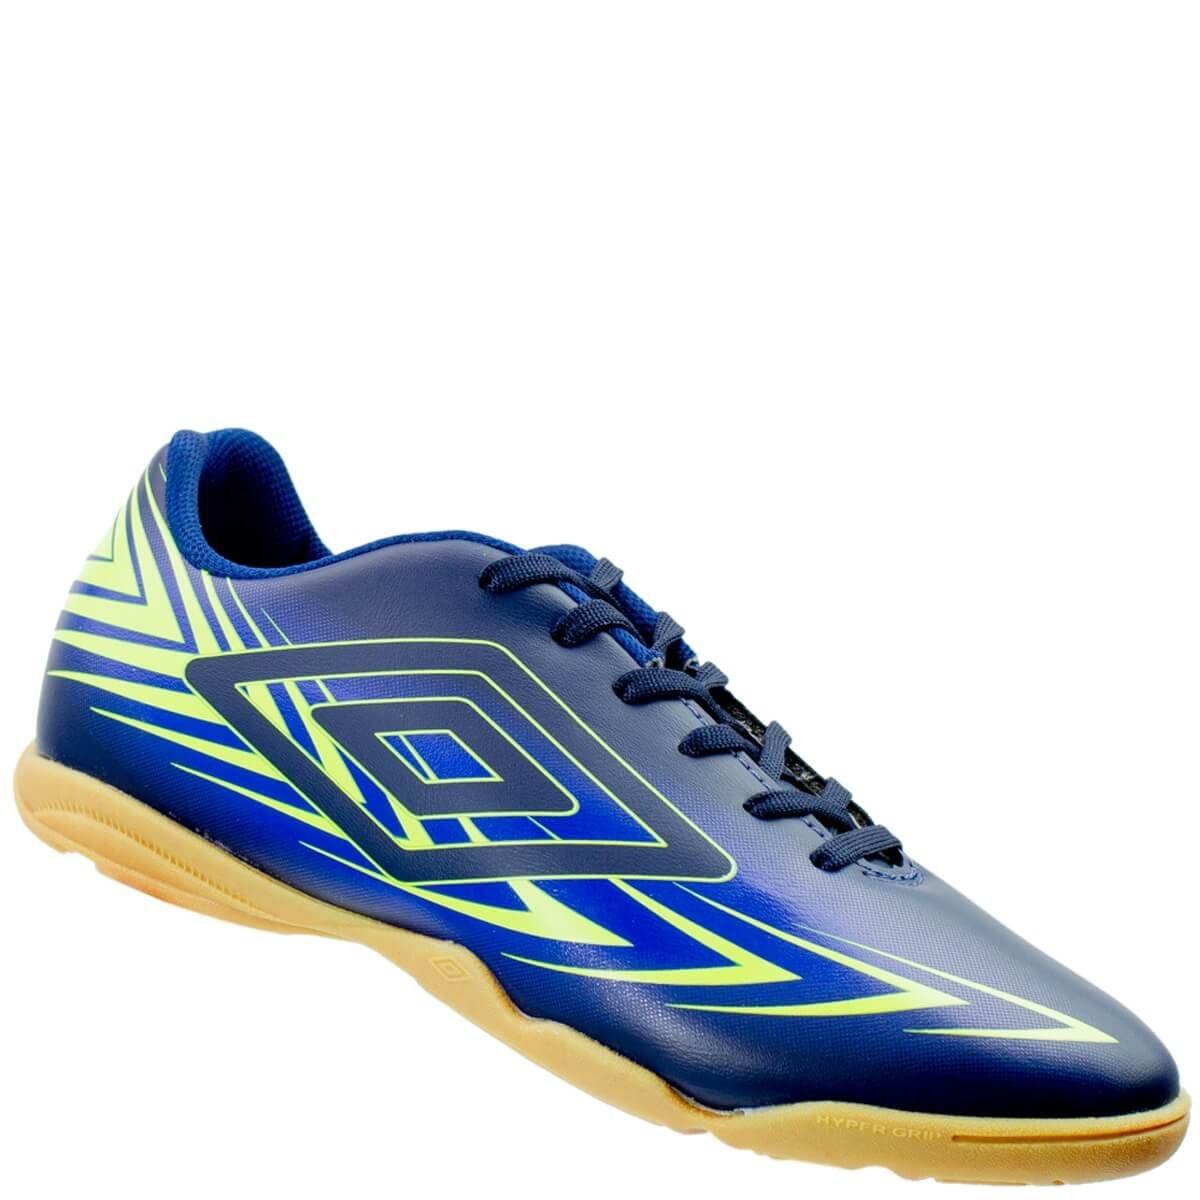 715f16fdbf3 Bizz Store - Chuteira Masculina Futsal Umbro Speed III